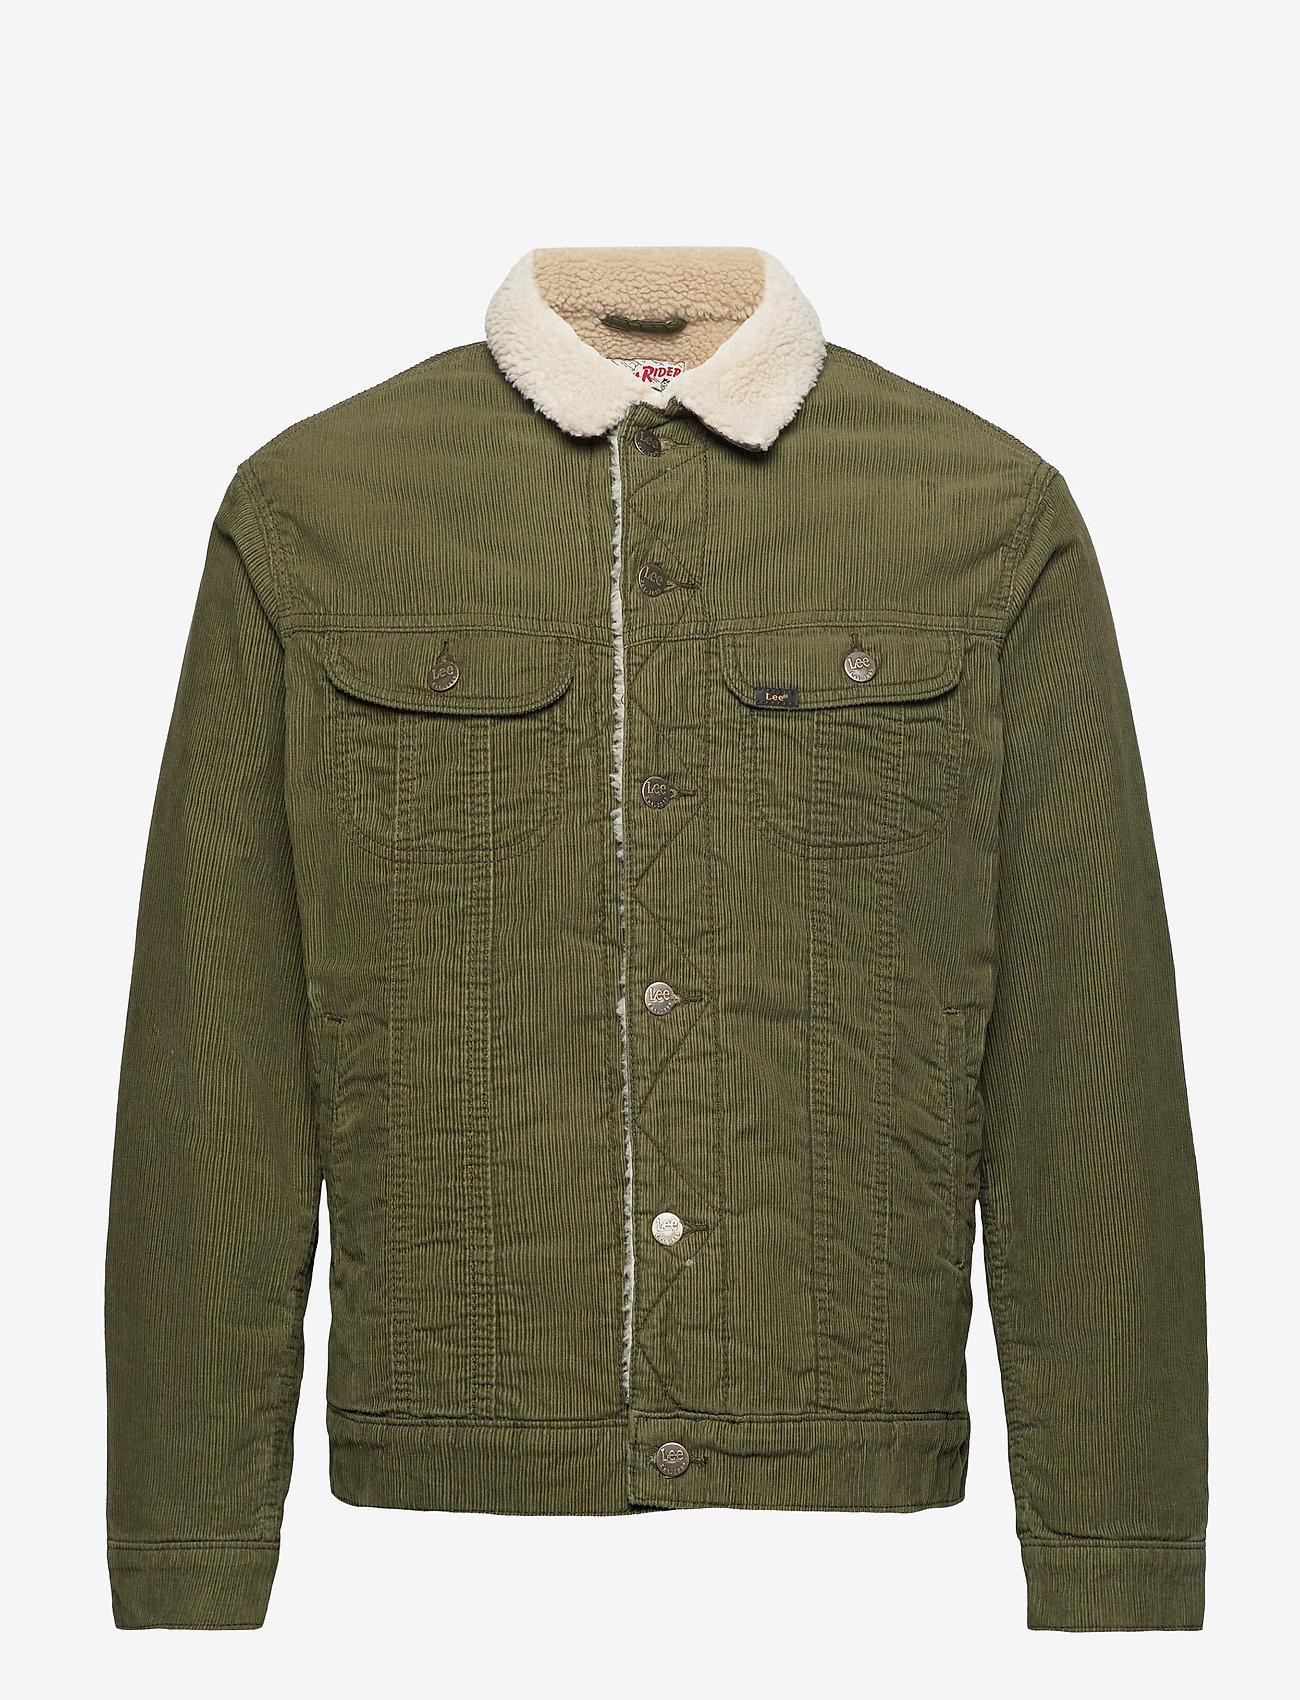 Lee Jeans - SHERPA JACKET - denim jackets - olive green - 1